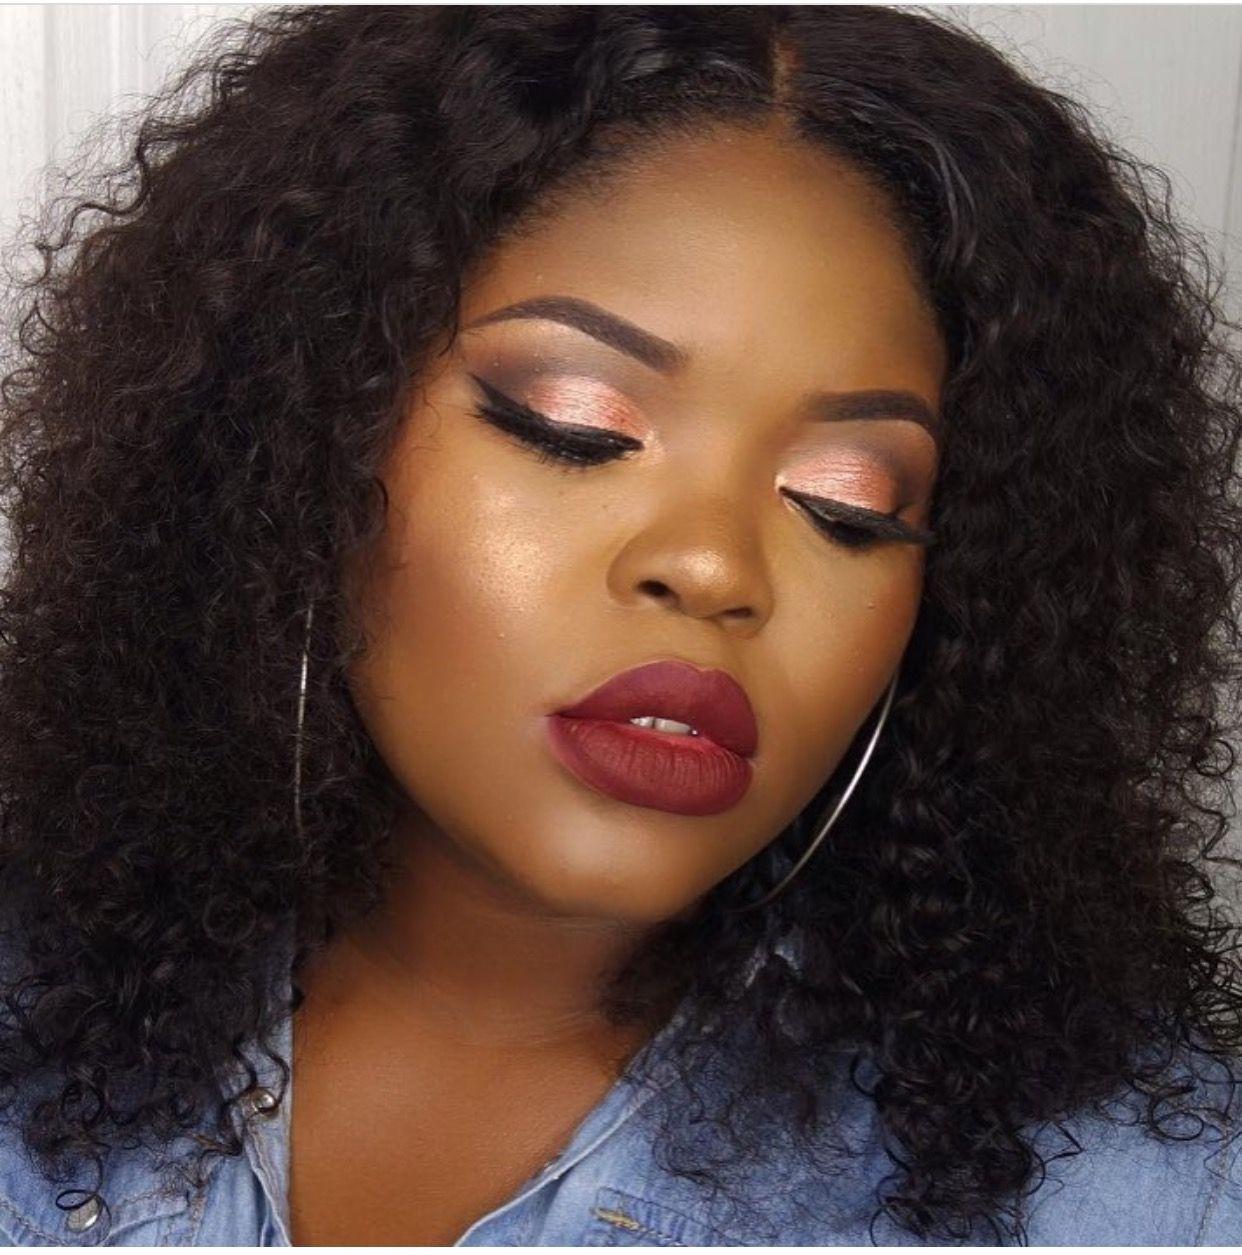 Makeup for black women (With images) Black girl makeup